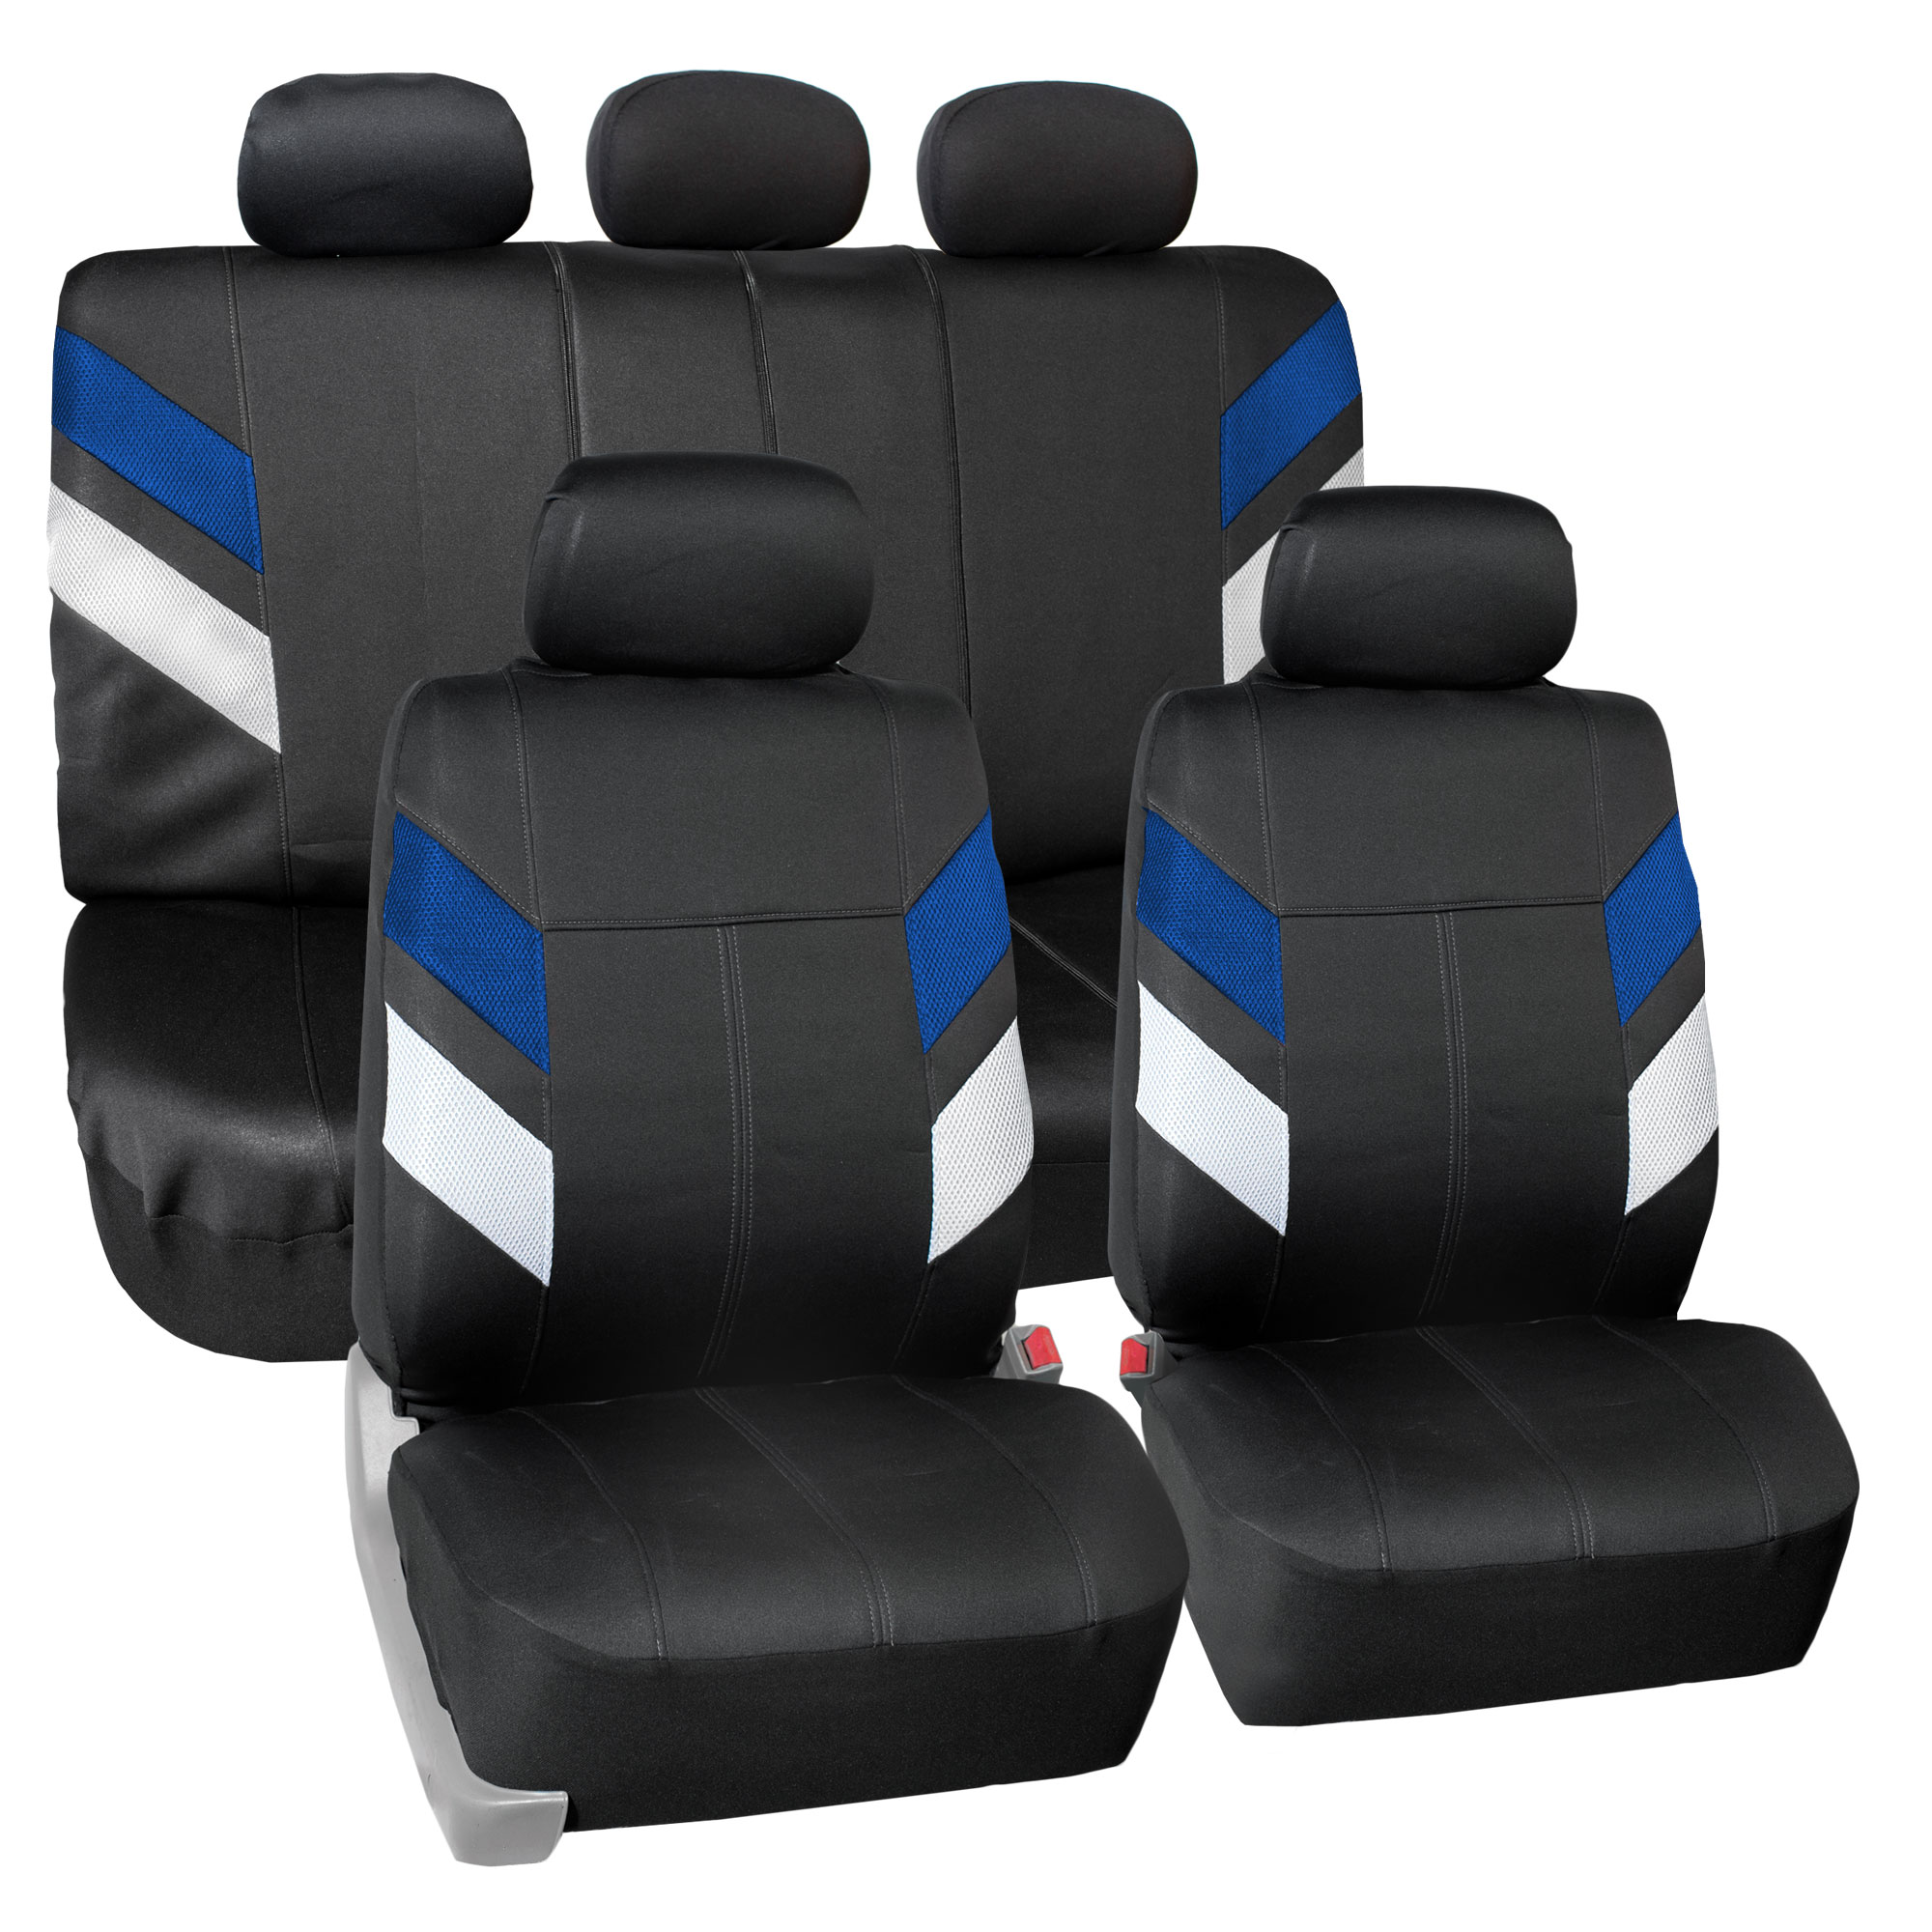 FH Group Modern Edge Waterproof Durable Neoprene Full Set Seat Covers, Blue